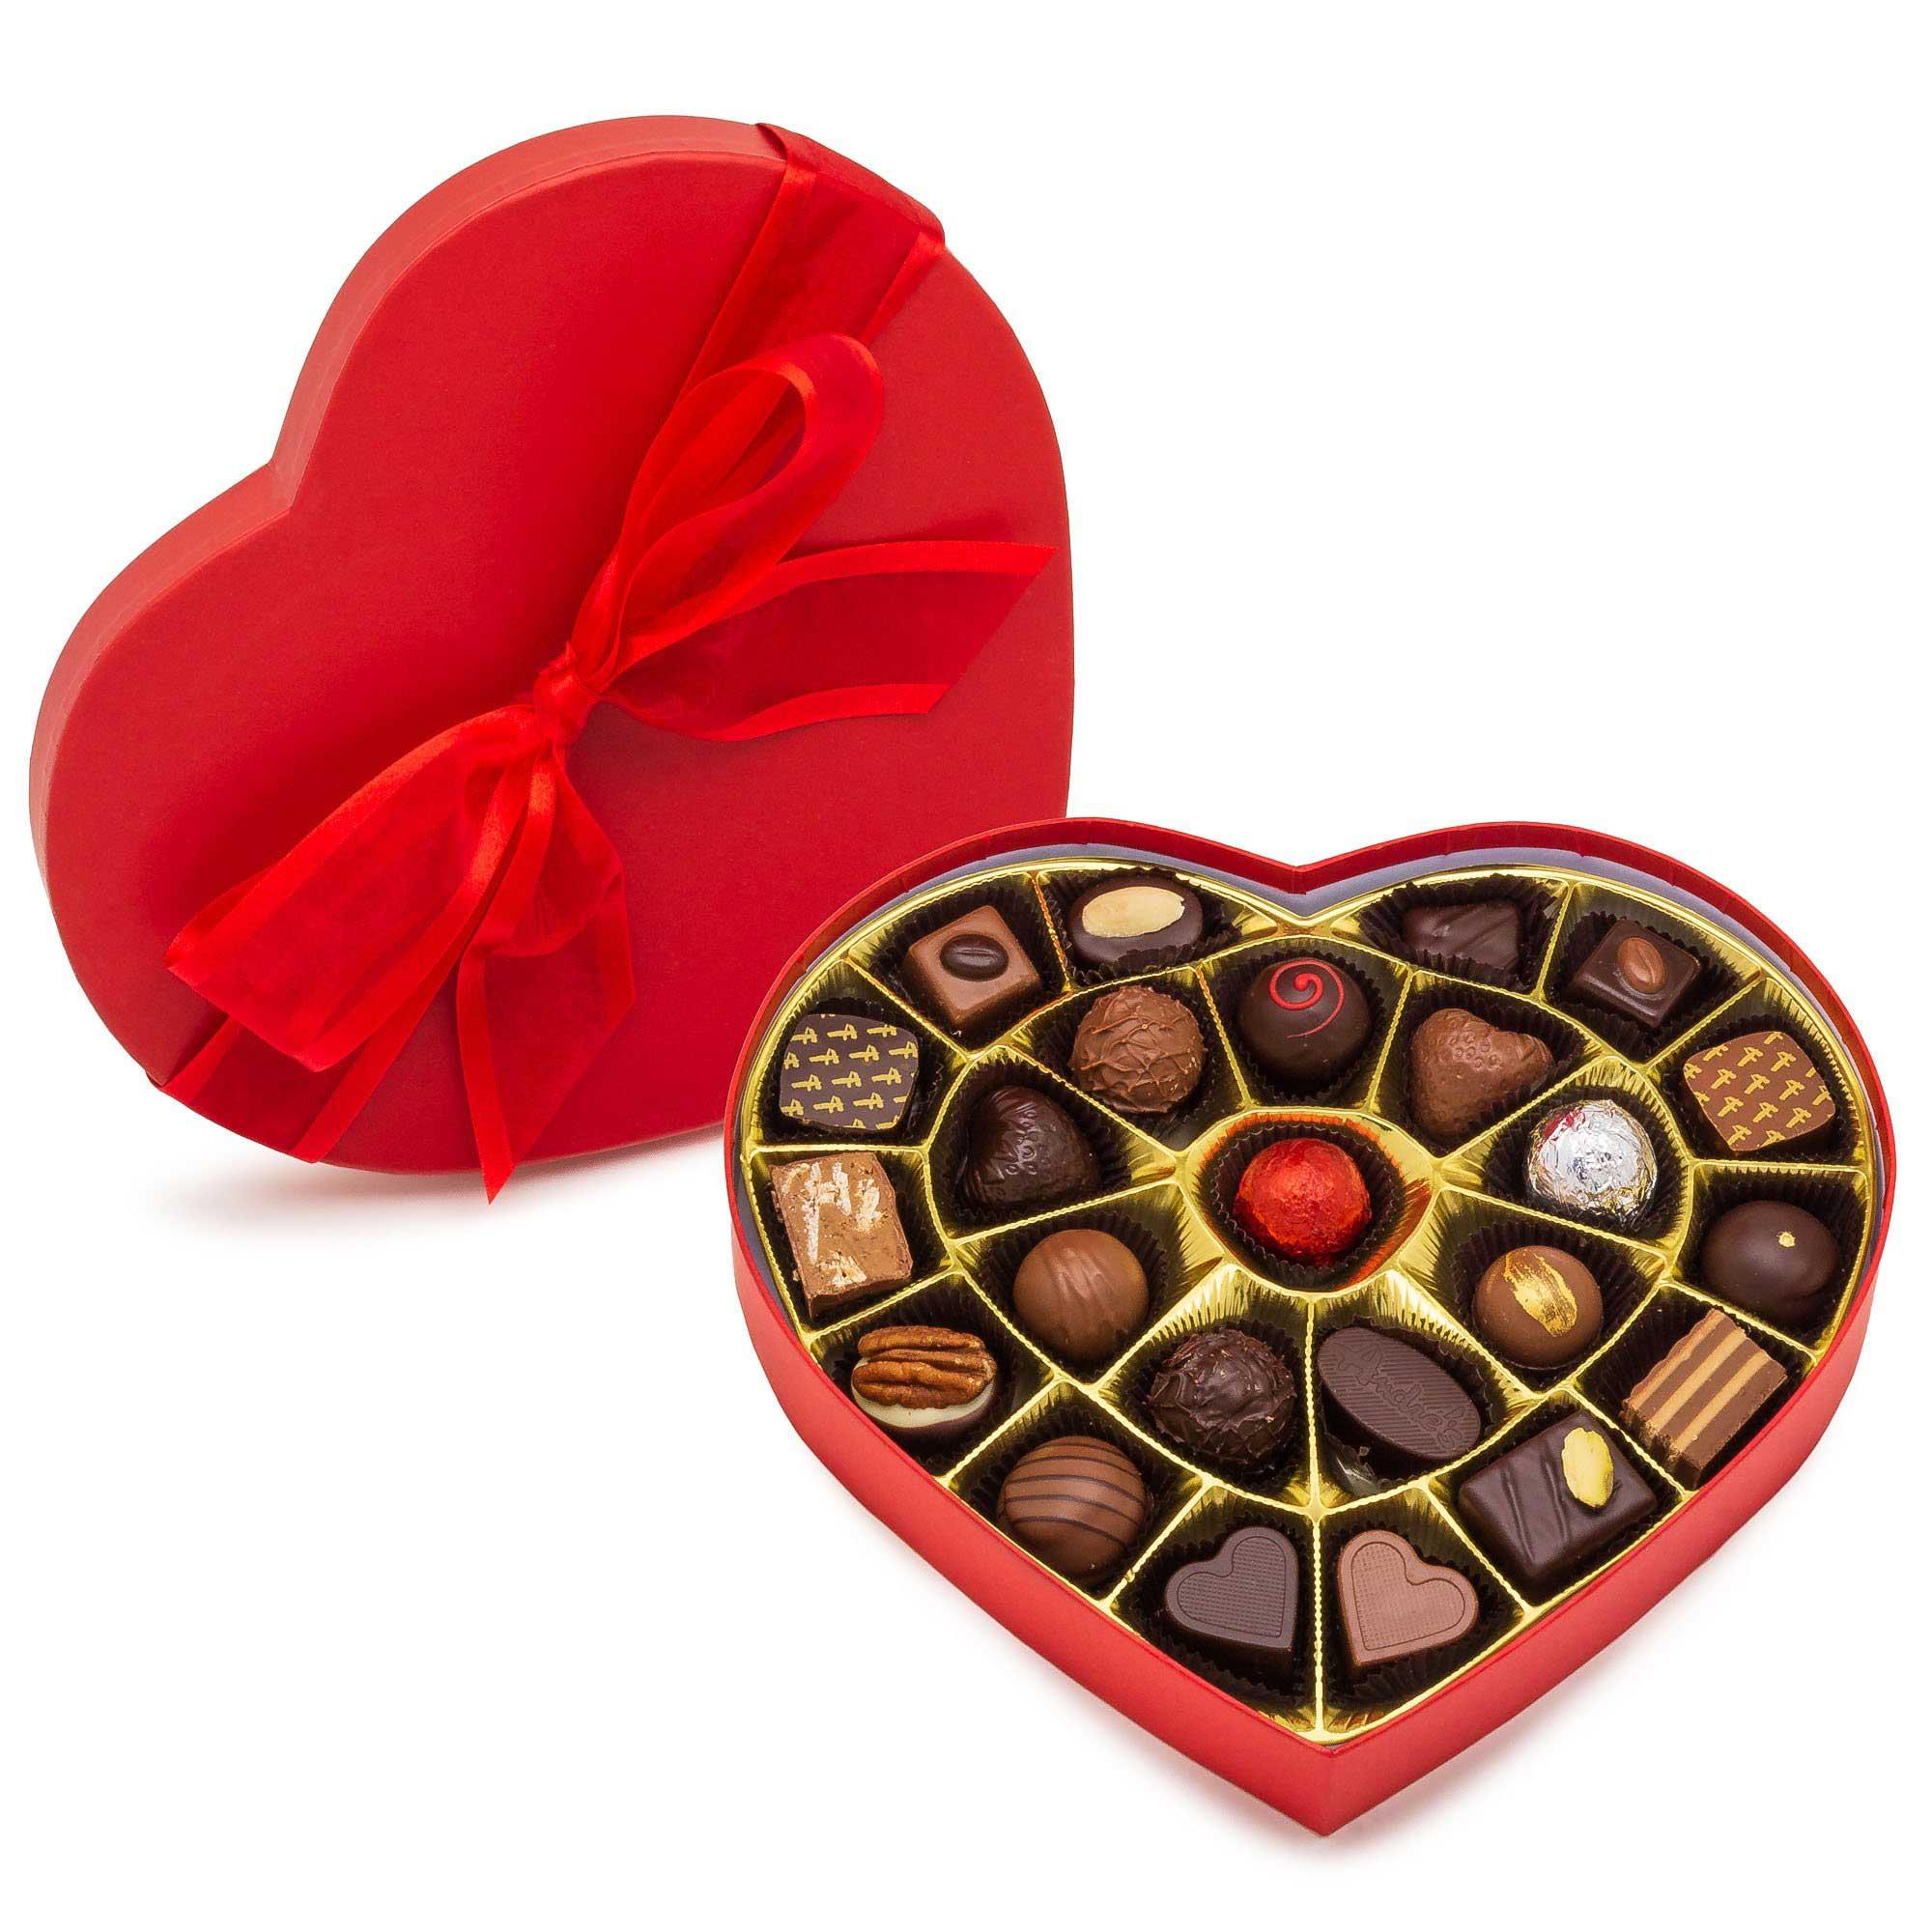 Heart Box of Grand Assortment